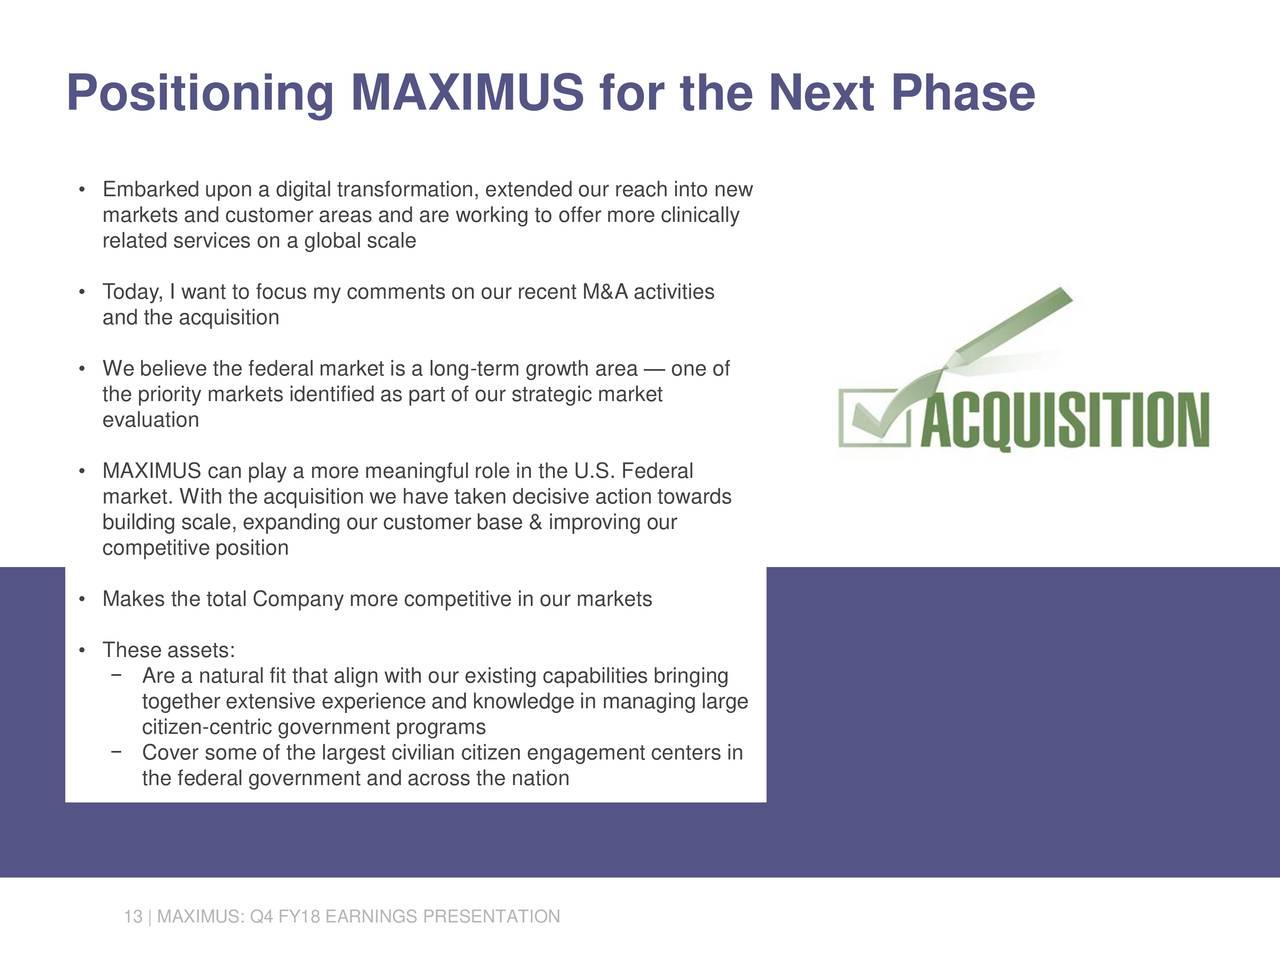 MAXIMUS, Inc. 2018 Q4 - Results